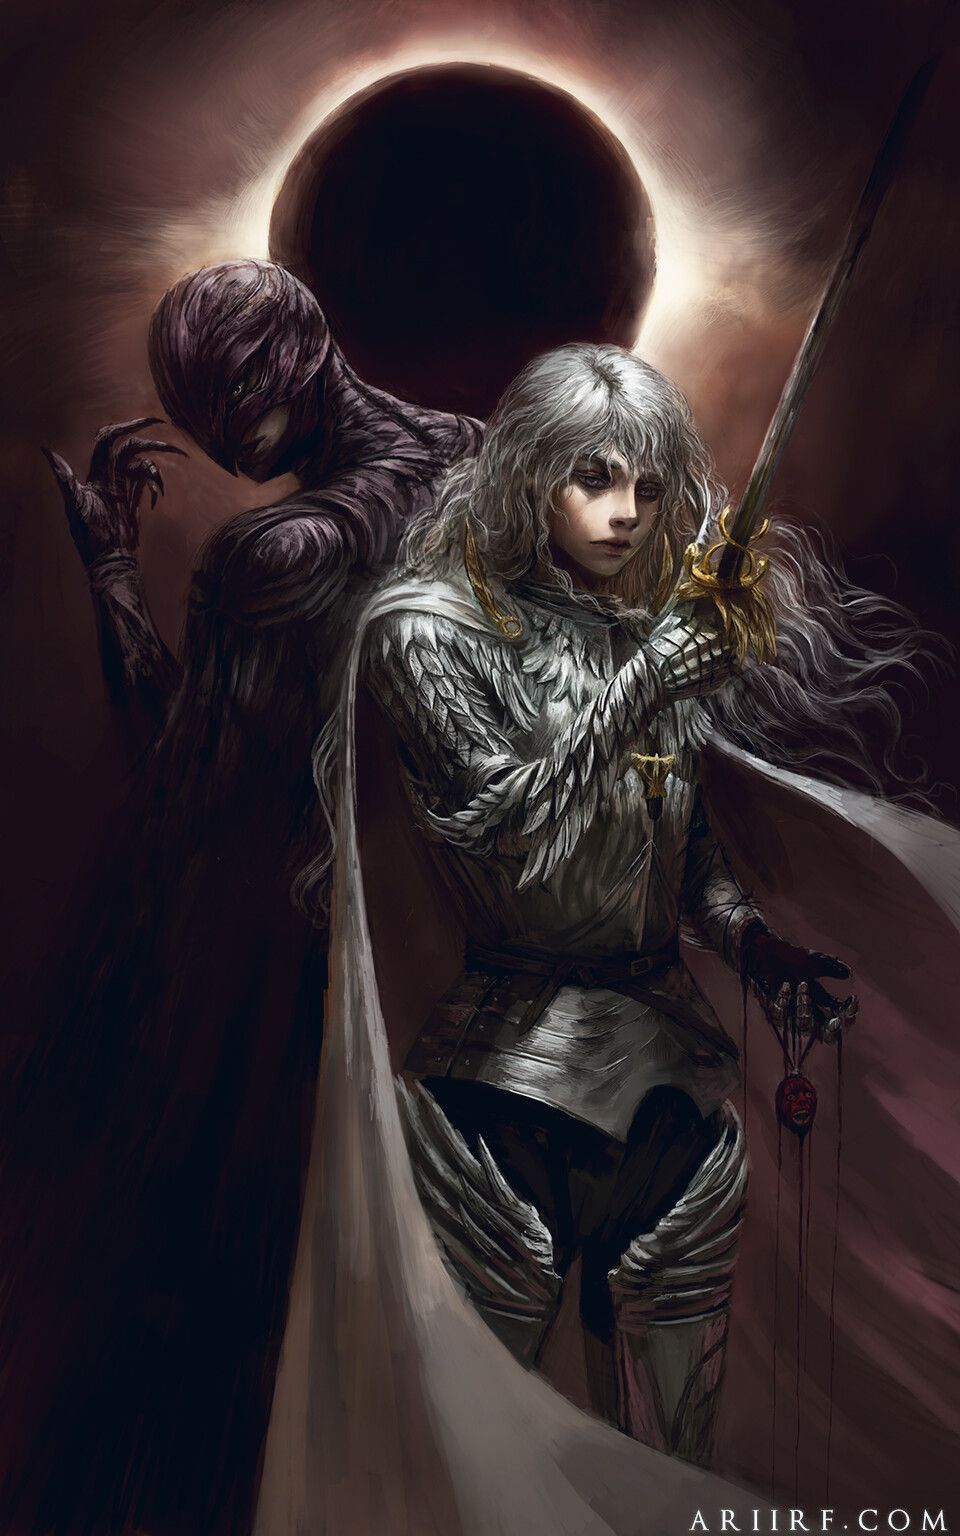 The White Hawk by Ari Ibarra in 2020 Berserk, Griffith